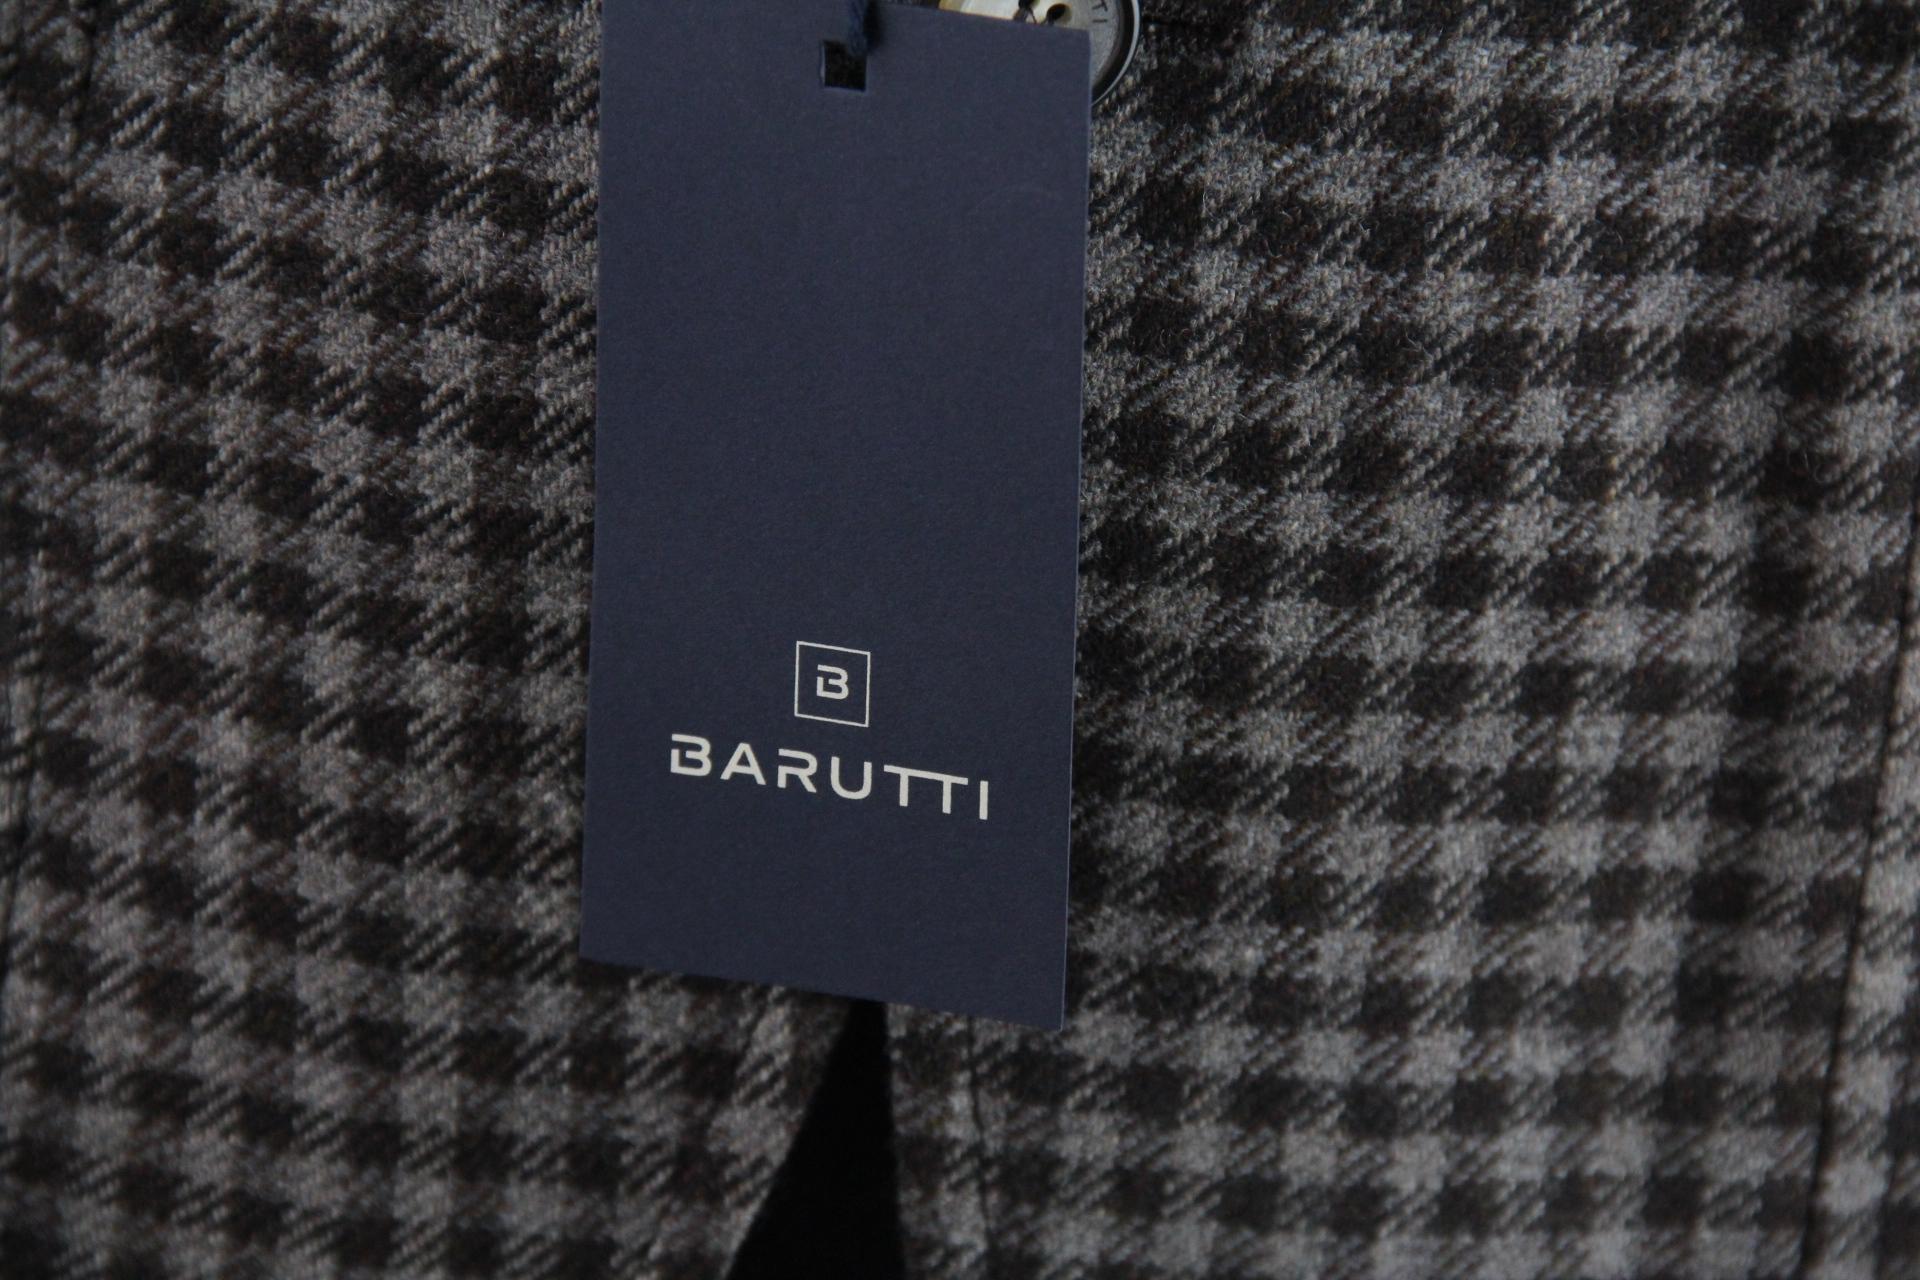 Barutti braun-grau-kariertes Sakko Gr.48 S Schurwolle Kaschmir Zwei ... 288fd6a9f1